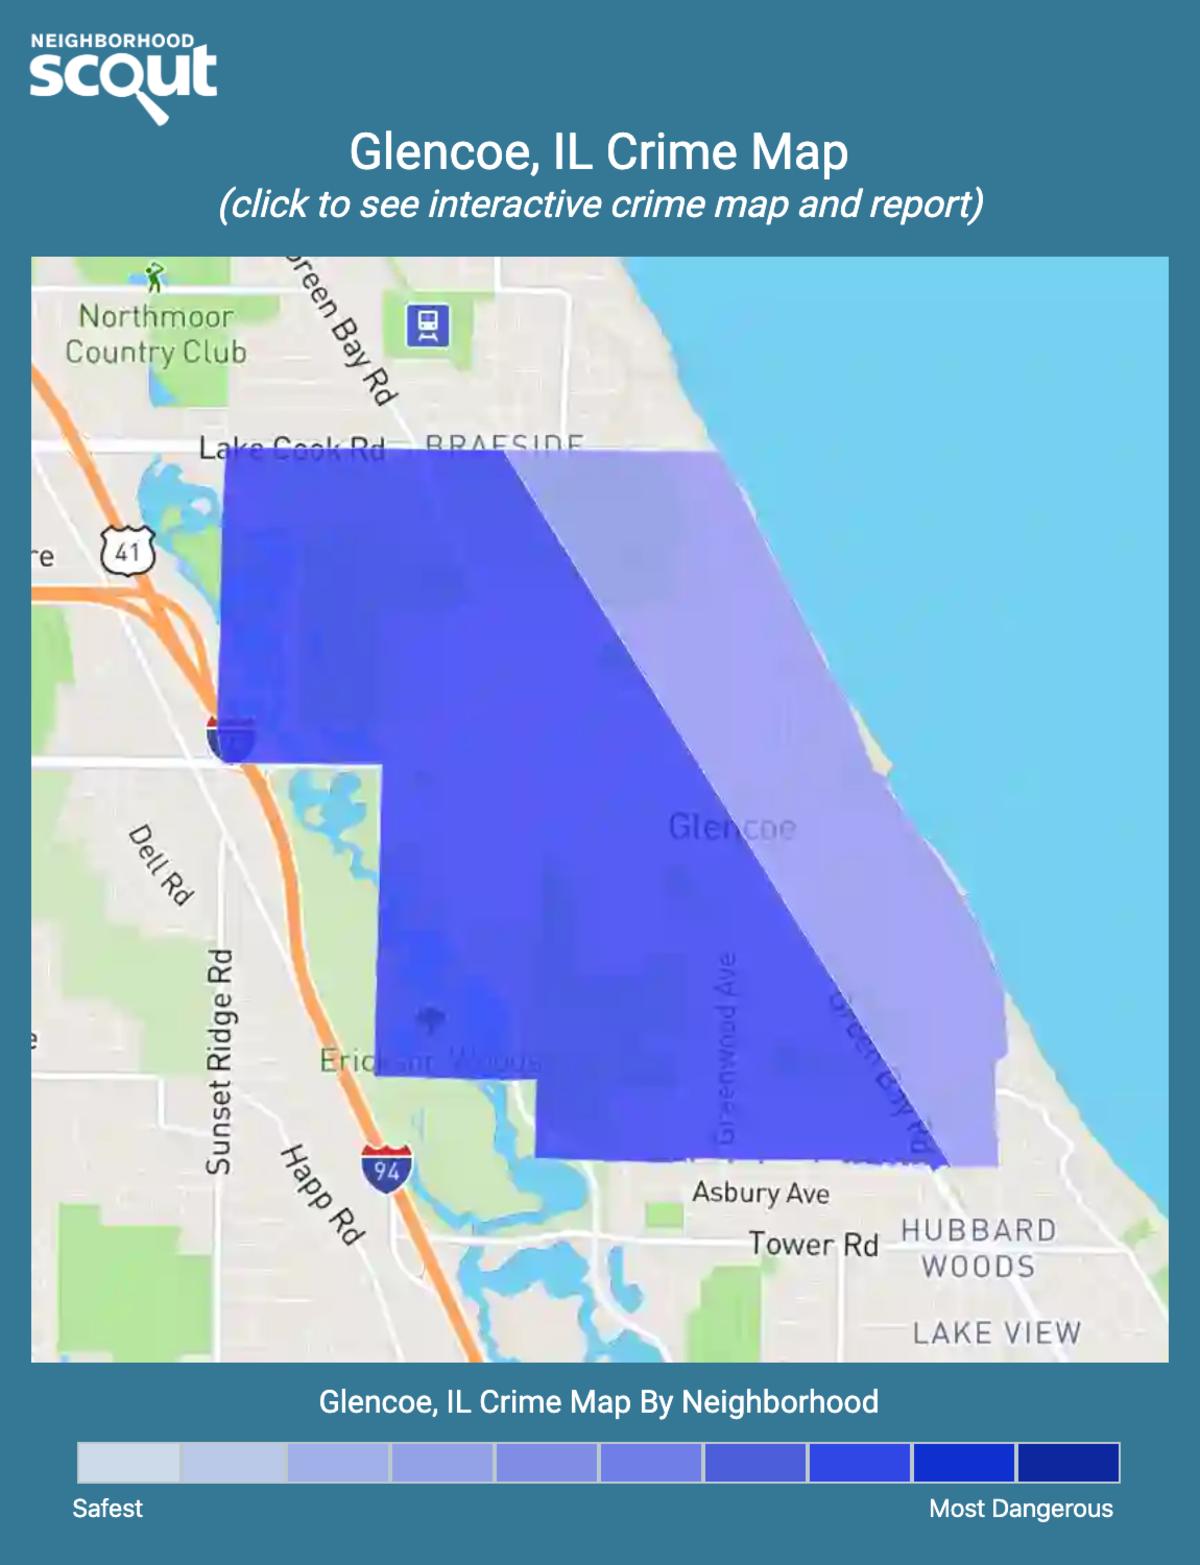 Glencoe, Illinois crime map